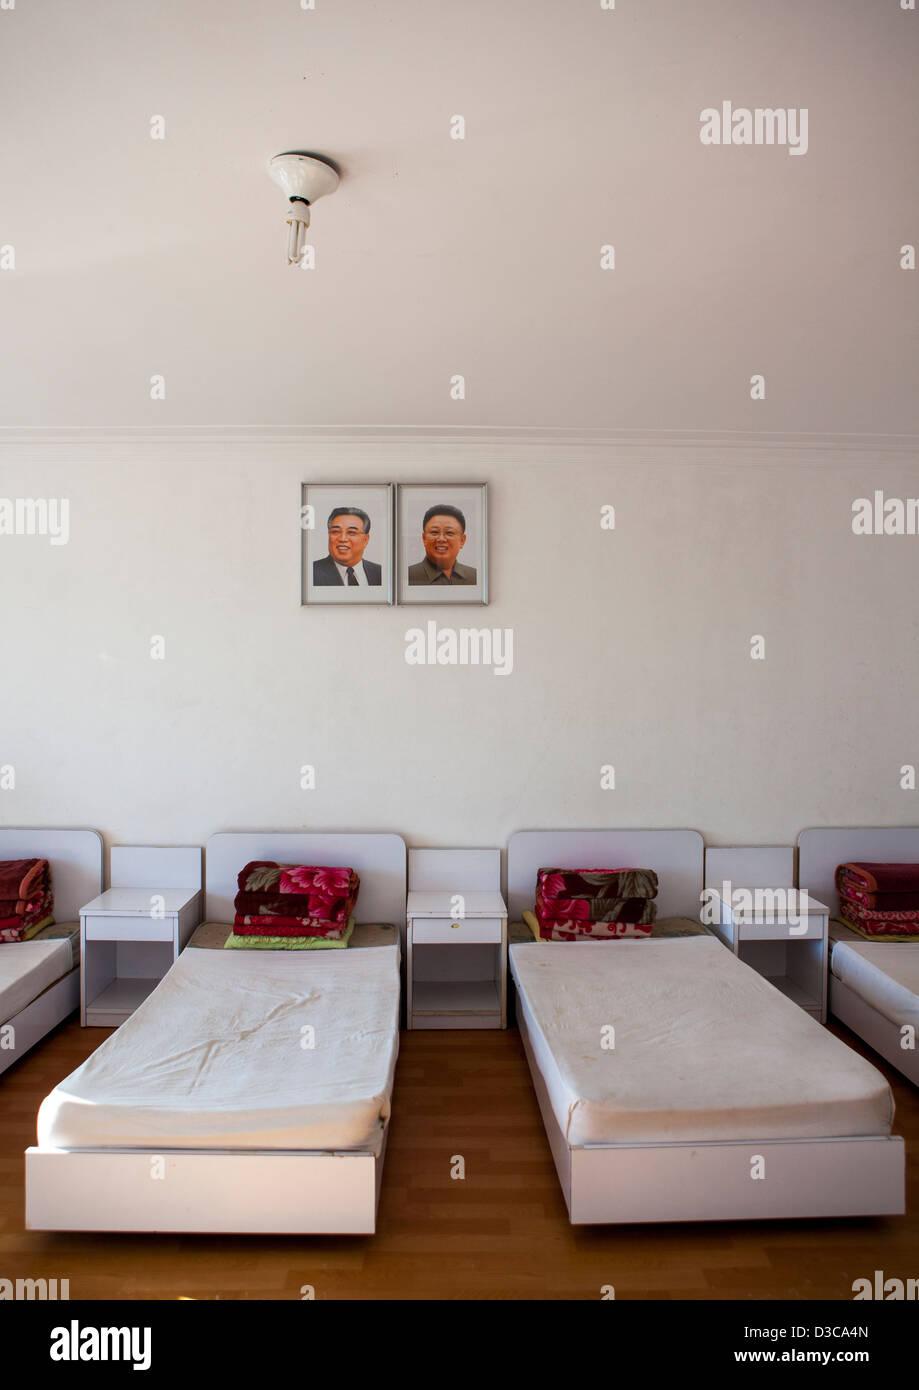 Bedroom In Songdowon International Children's Camp, Wonsan, North Korea, North Korea - Stock Image